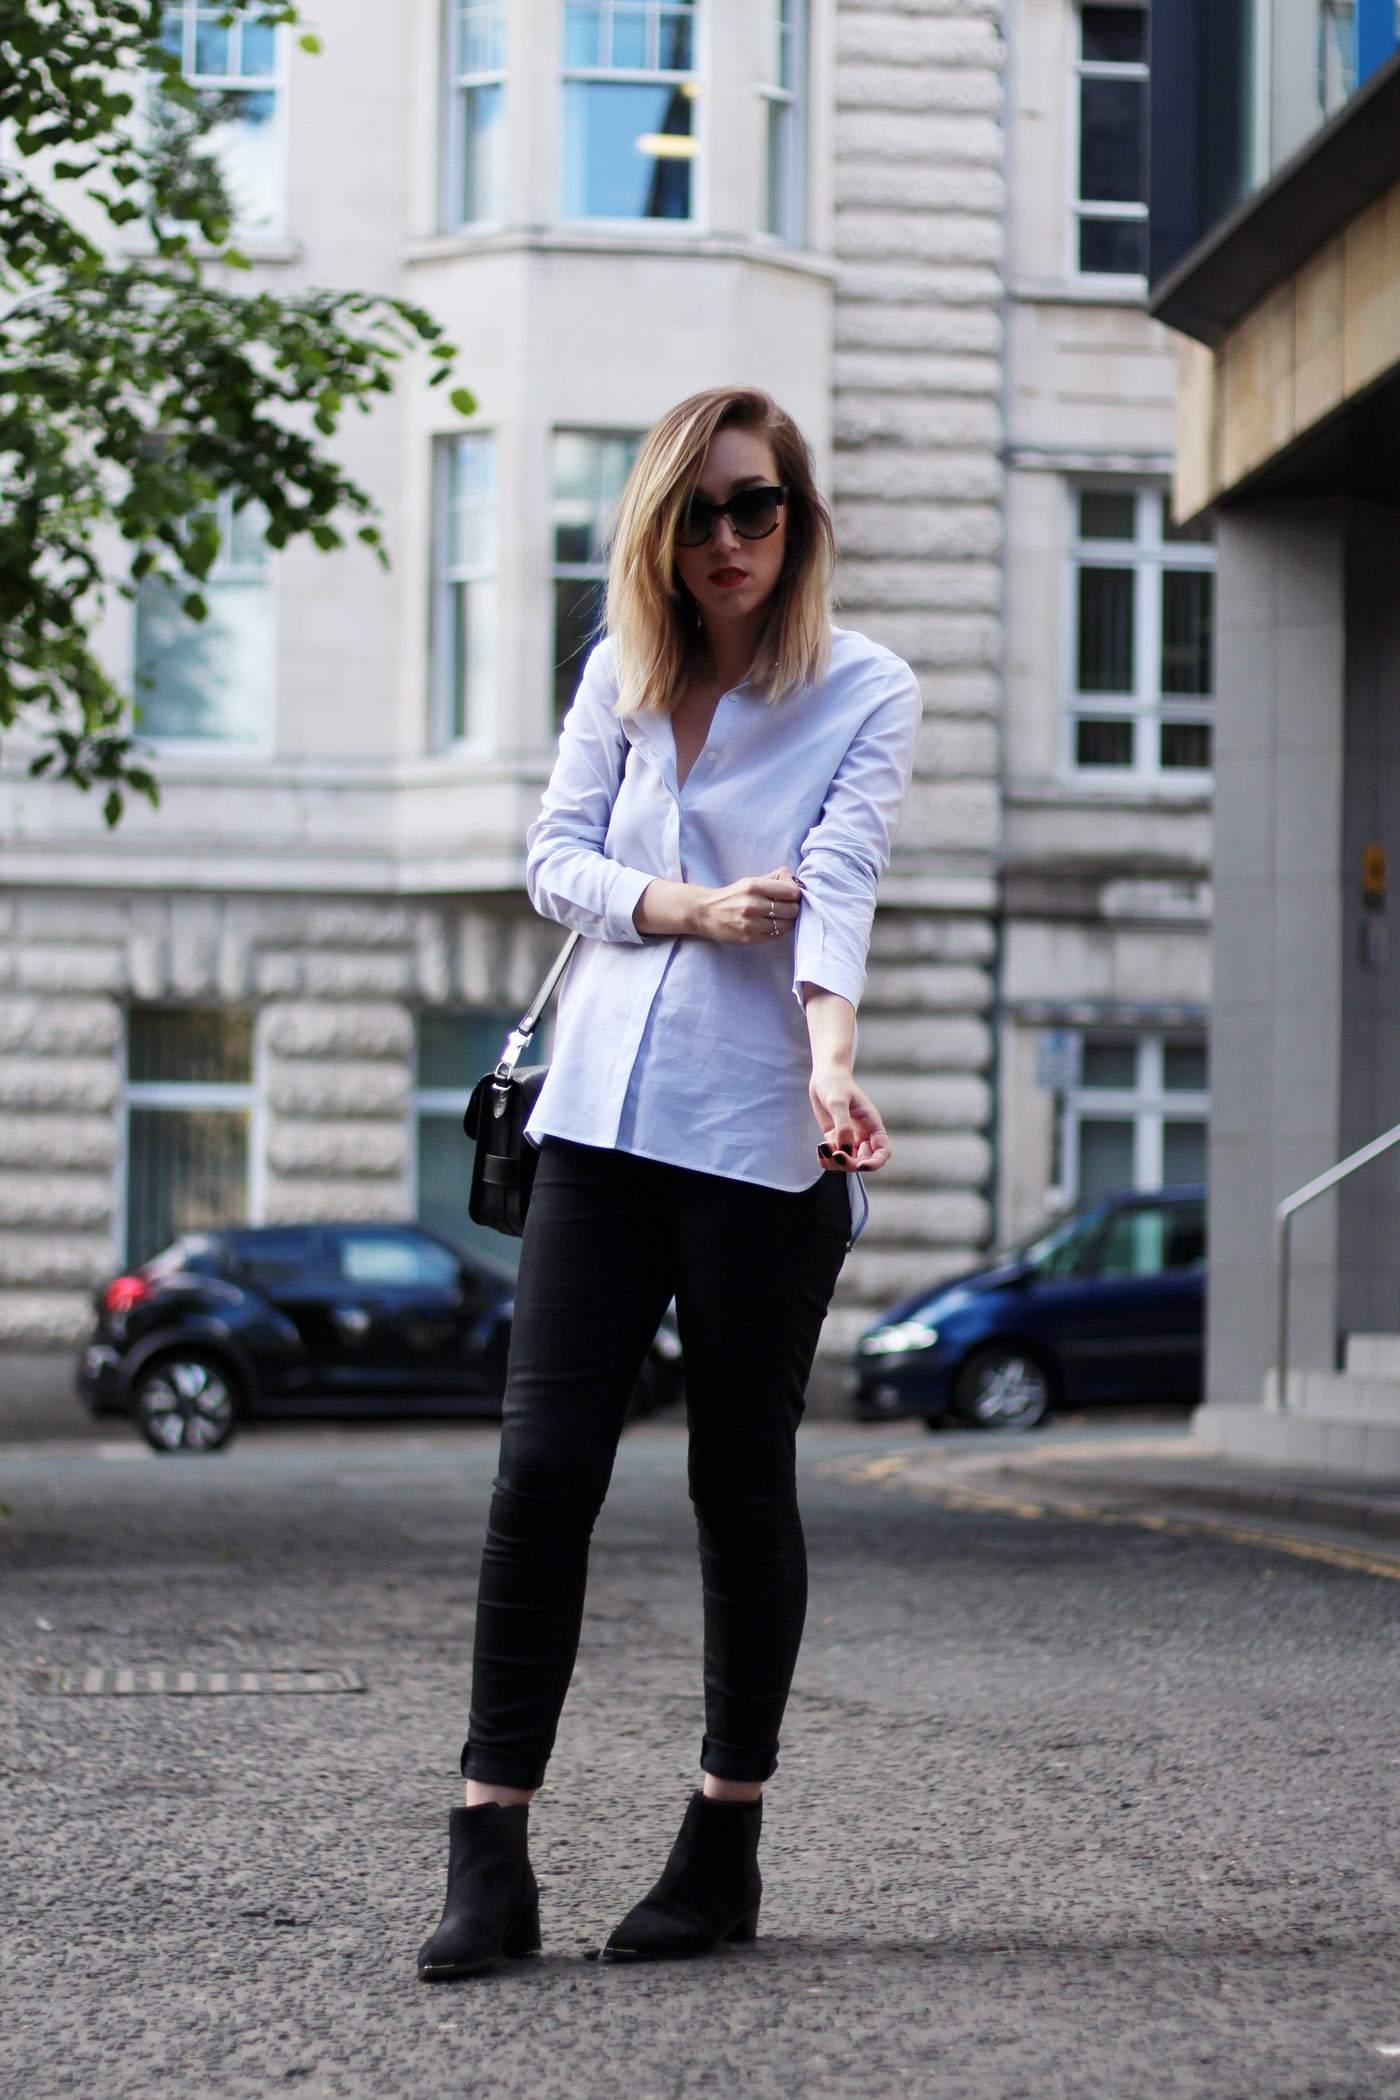 acne-jensen-boots-M&S-alexa-chung-ada-blazer-outfit-10